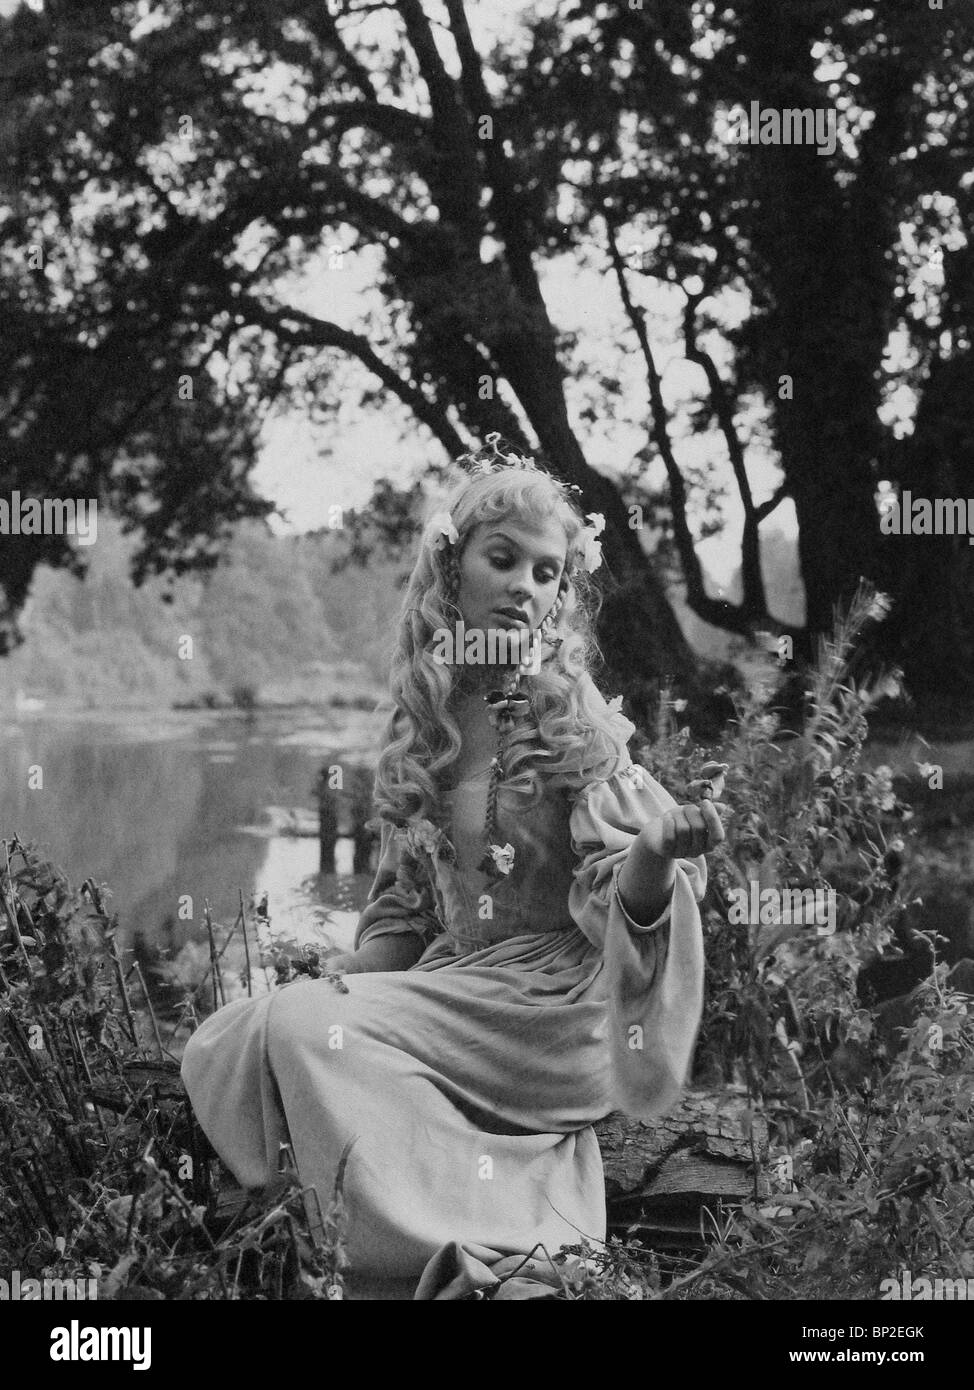 JEAN SIMMONS HAMLET (1948) - Stock Image